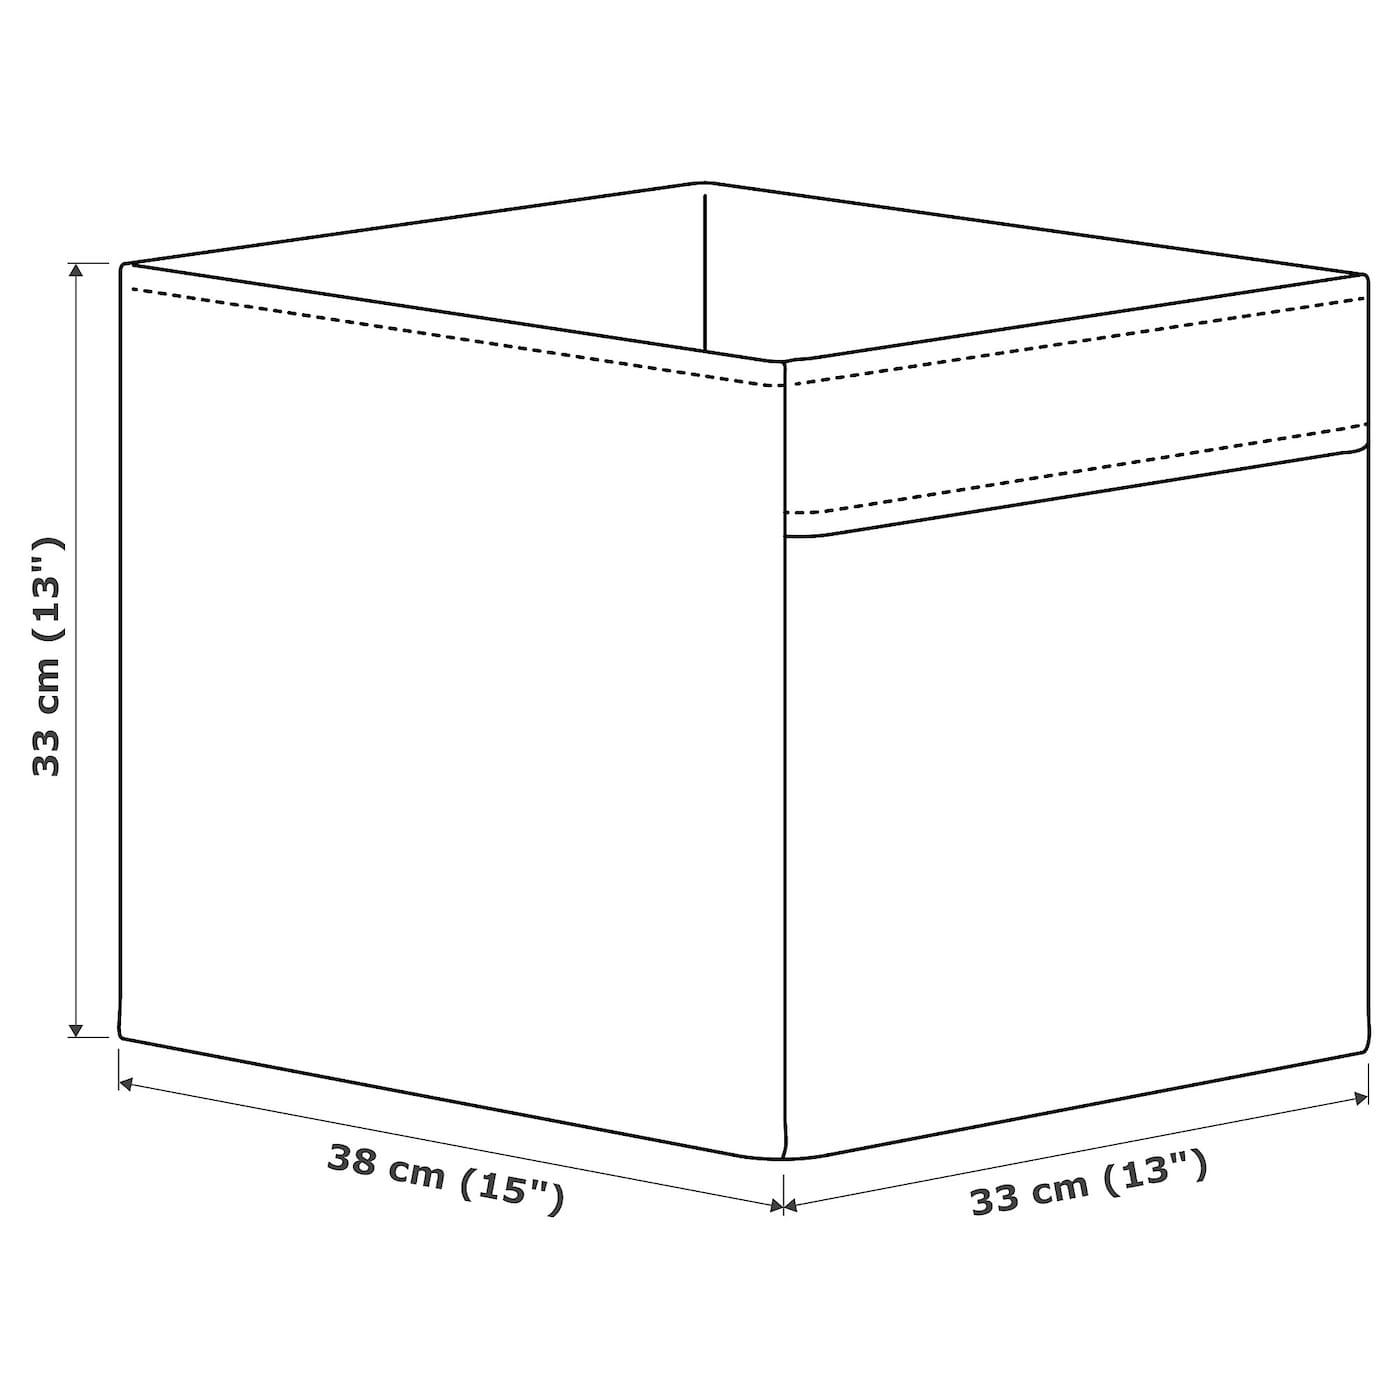 Ikea Dröna | Ikea dröna, Spielzimmer kinderzimmer, Ikea